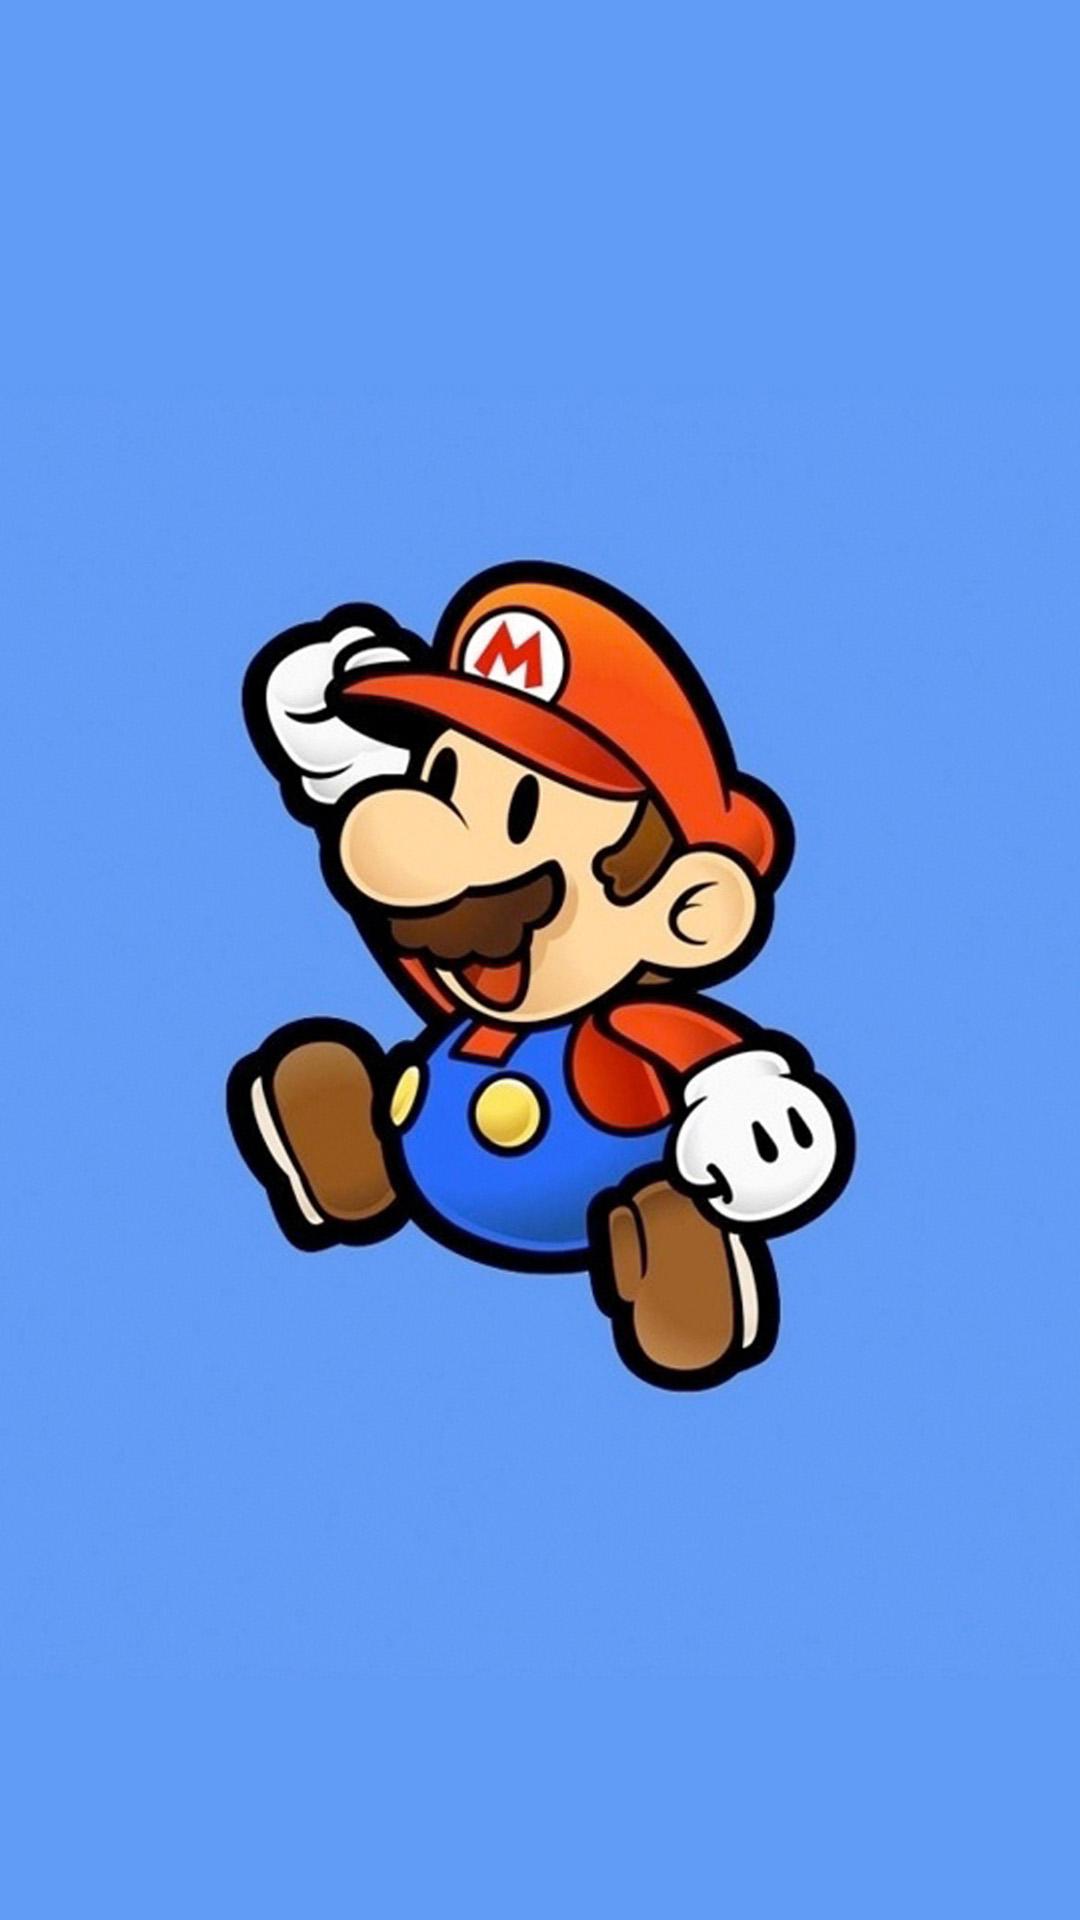 Mario - tapeta 5.